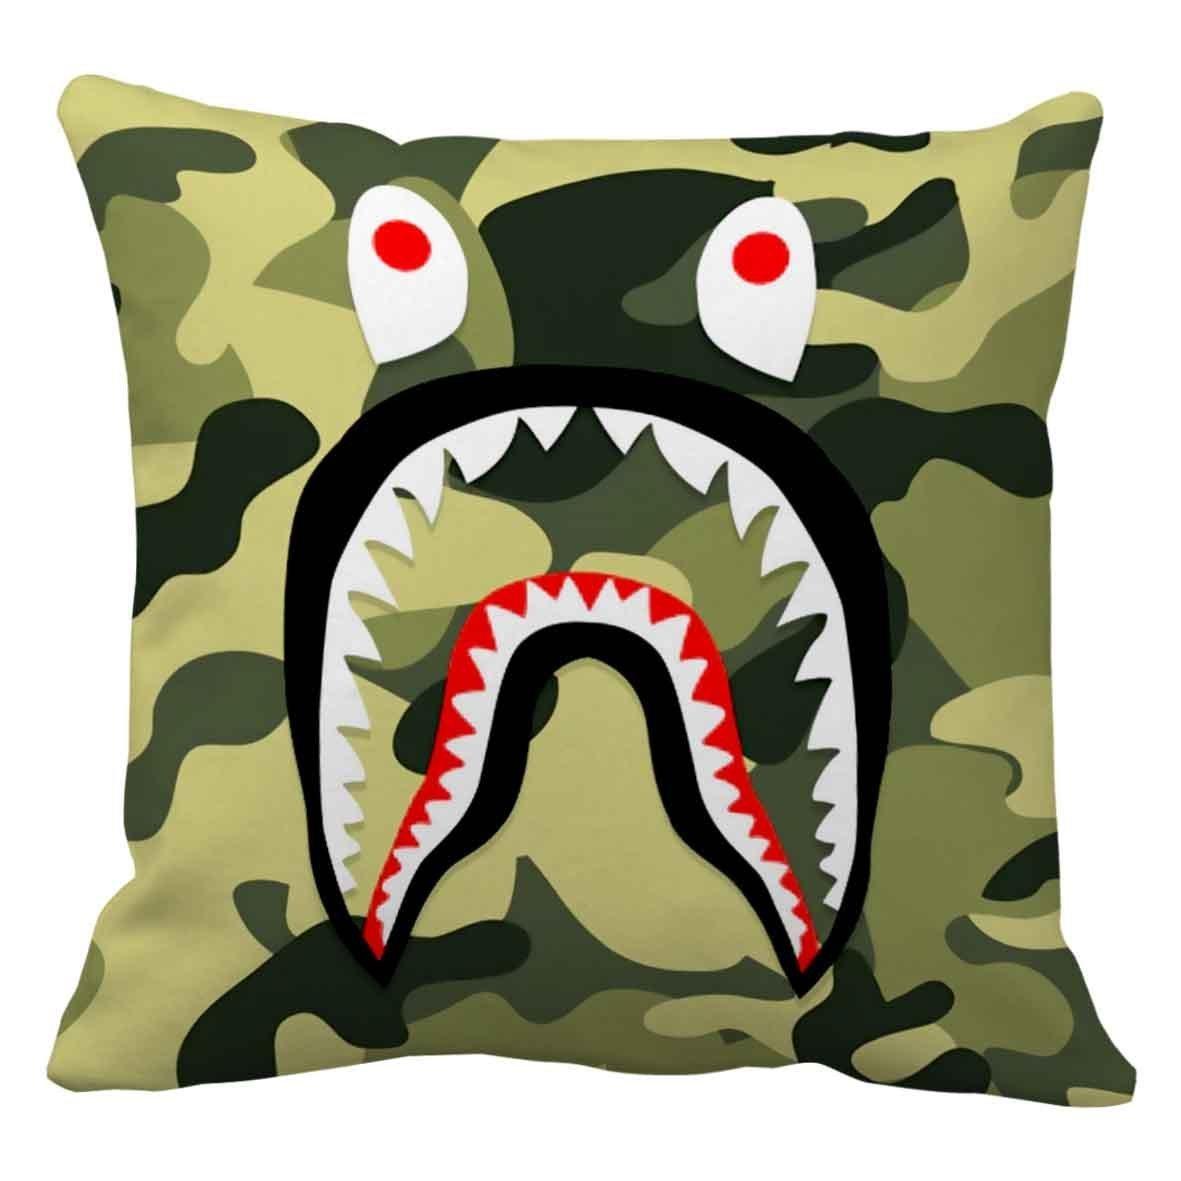 Hl Hlppc Bape Shark Green Camo Polyester Pillow Cover Size 16 X 16 Inches Buy Online In Grenada At Grenada Desertcart Com Productid 41060572